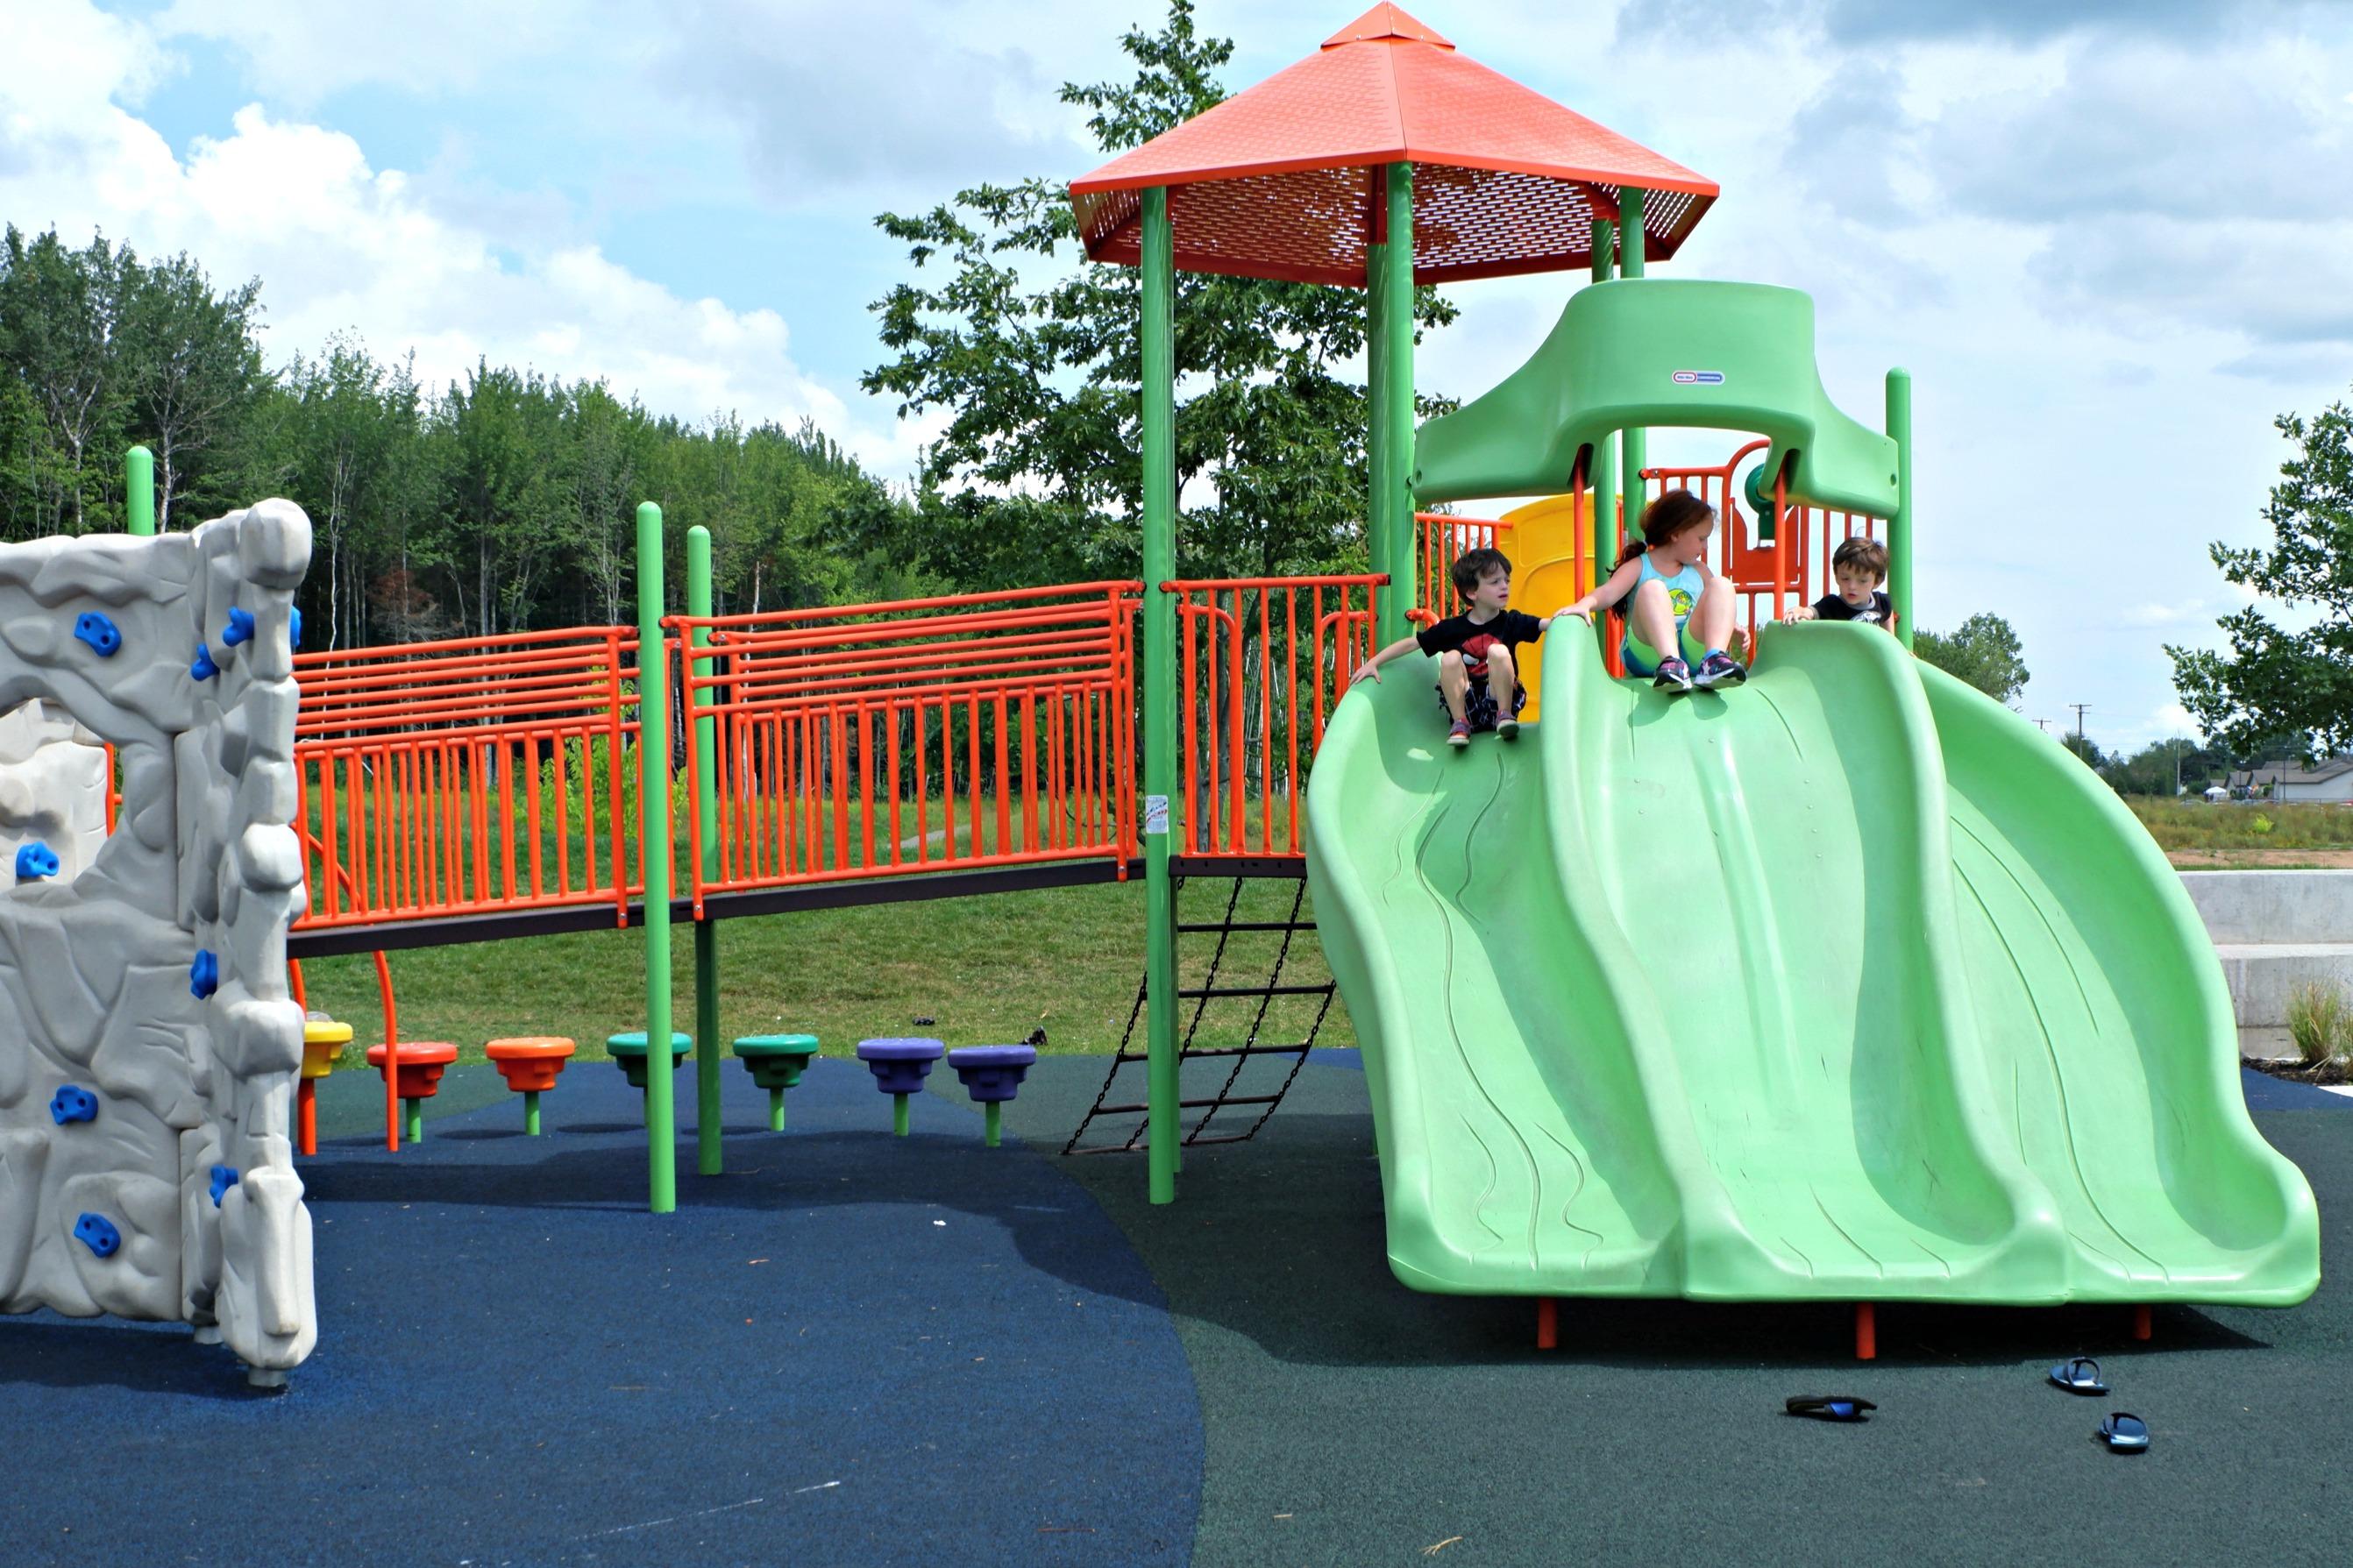 fairview knoll playground park moncton splash pad pickle planet near highway triple slide